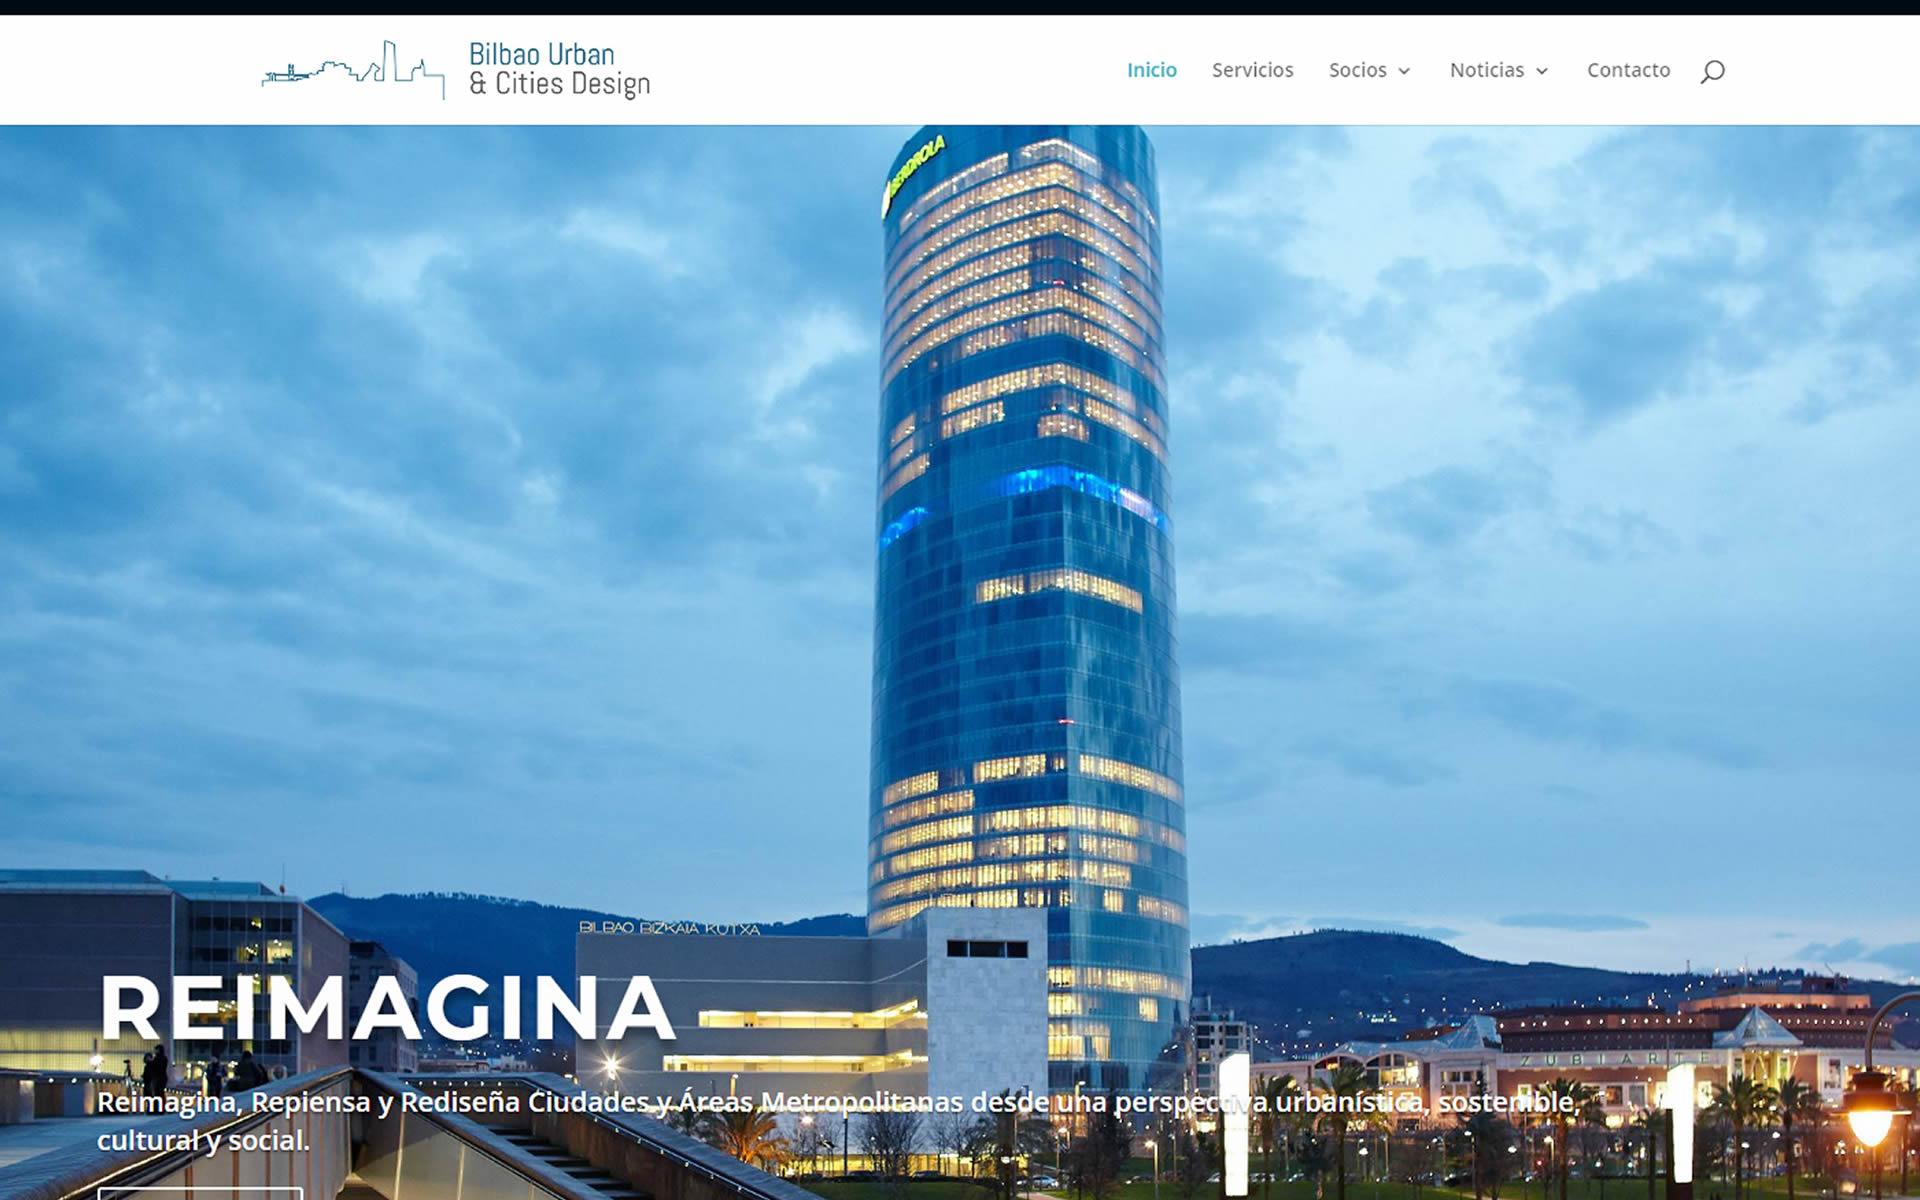 Becas Prácticas profesionales remuneradas en Bilbao urban & cities design con Fundación Novia Salcedo.